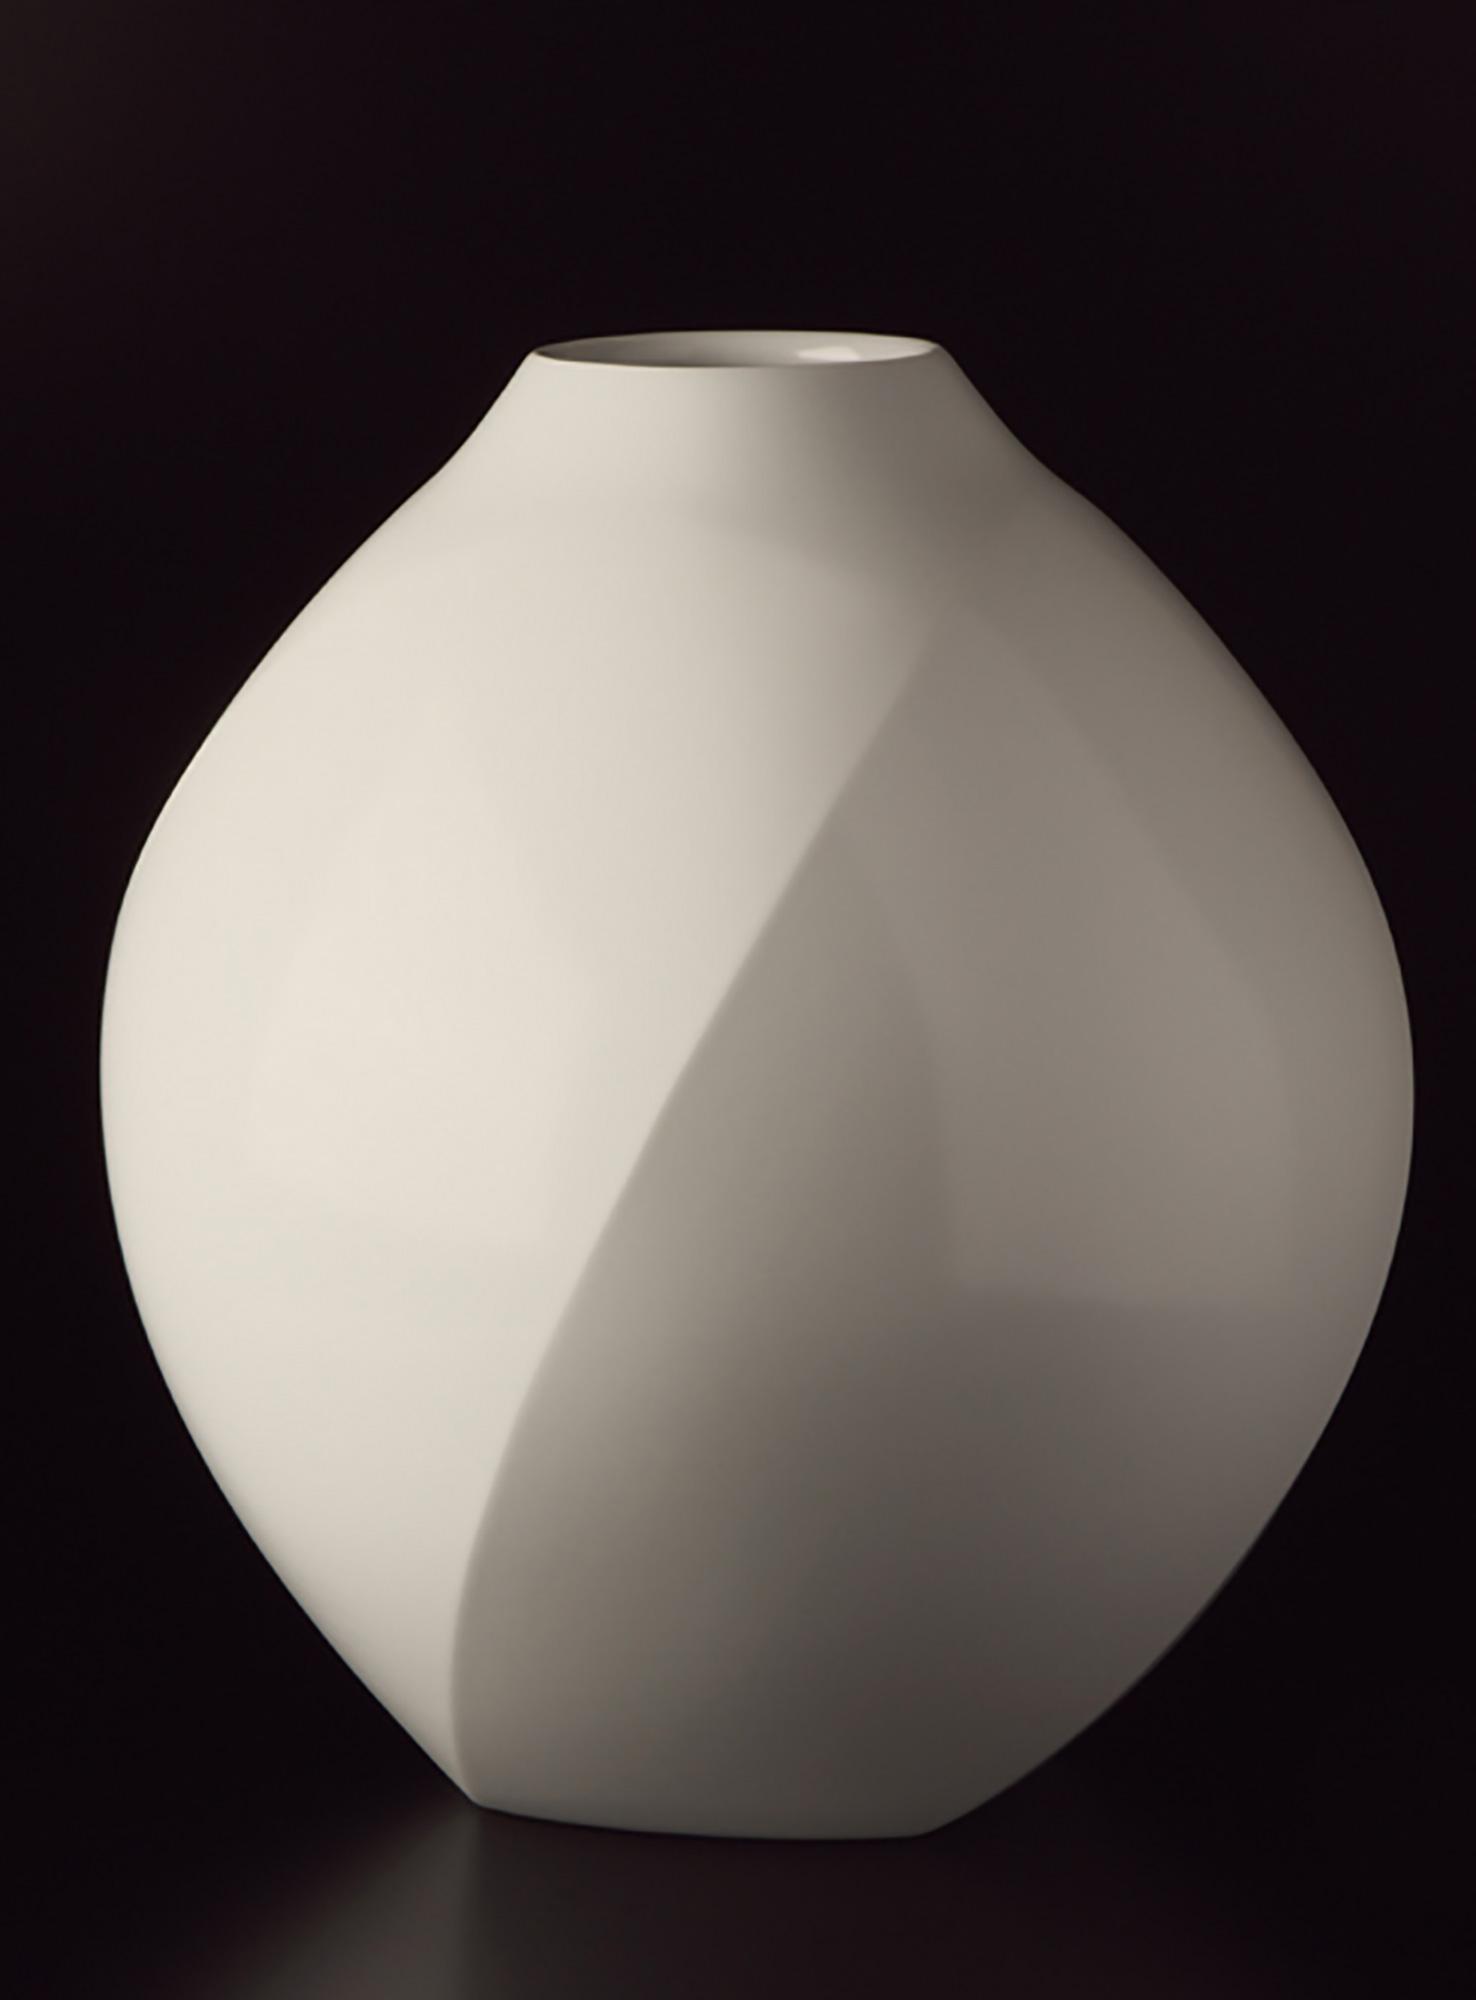 White Porcelain Faceted Vase(2011)